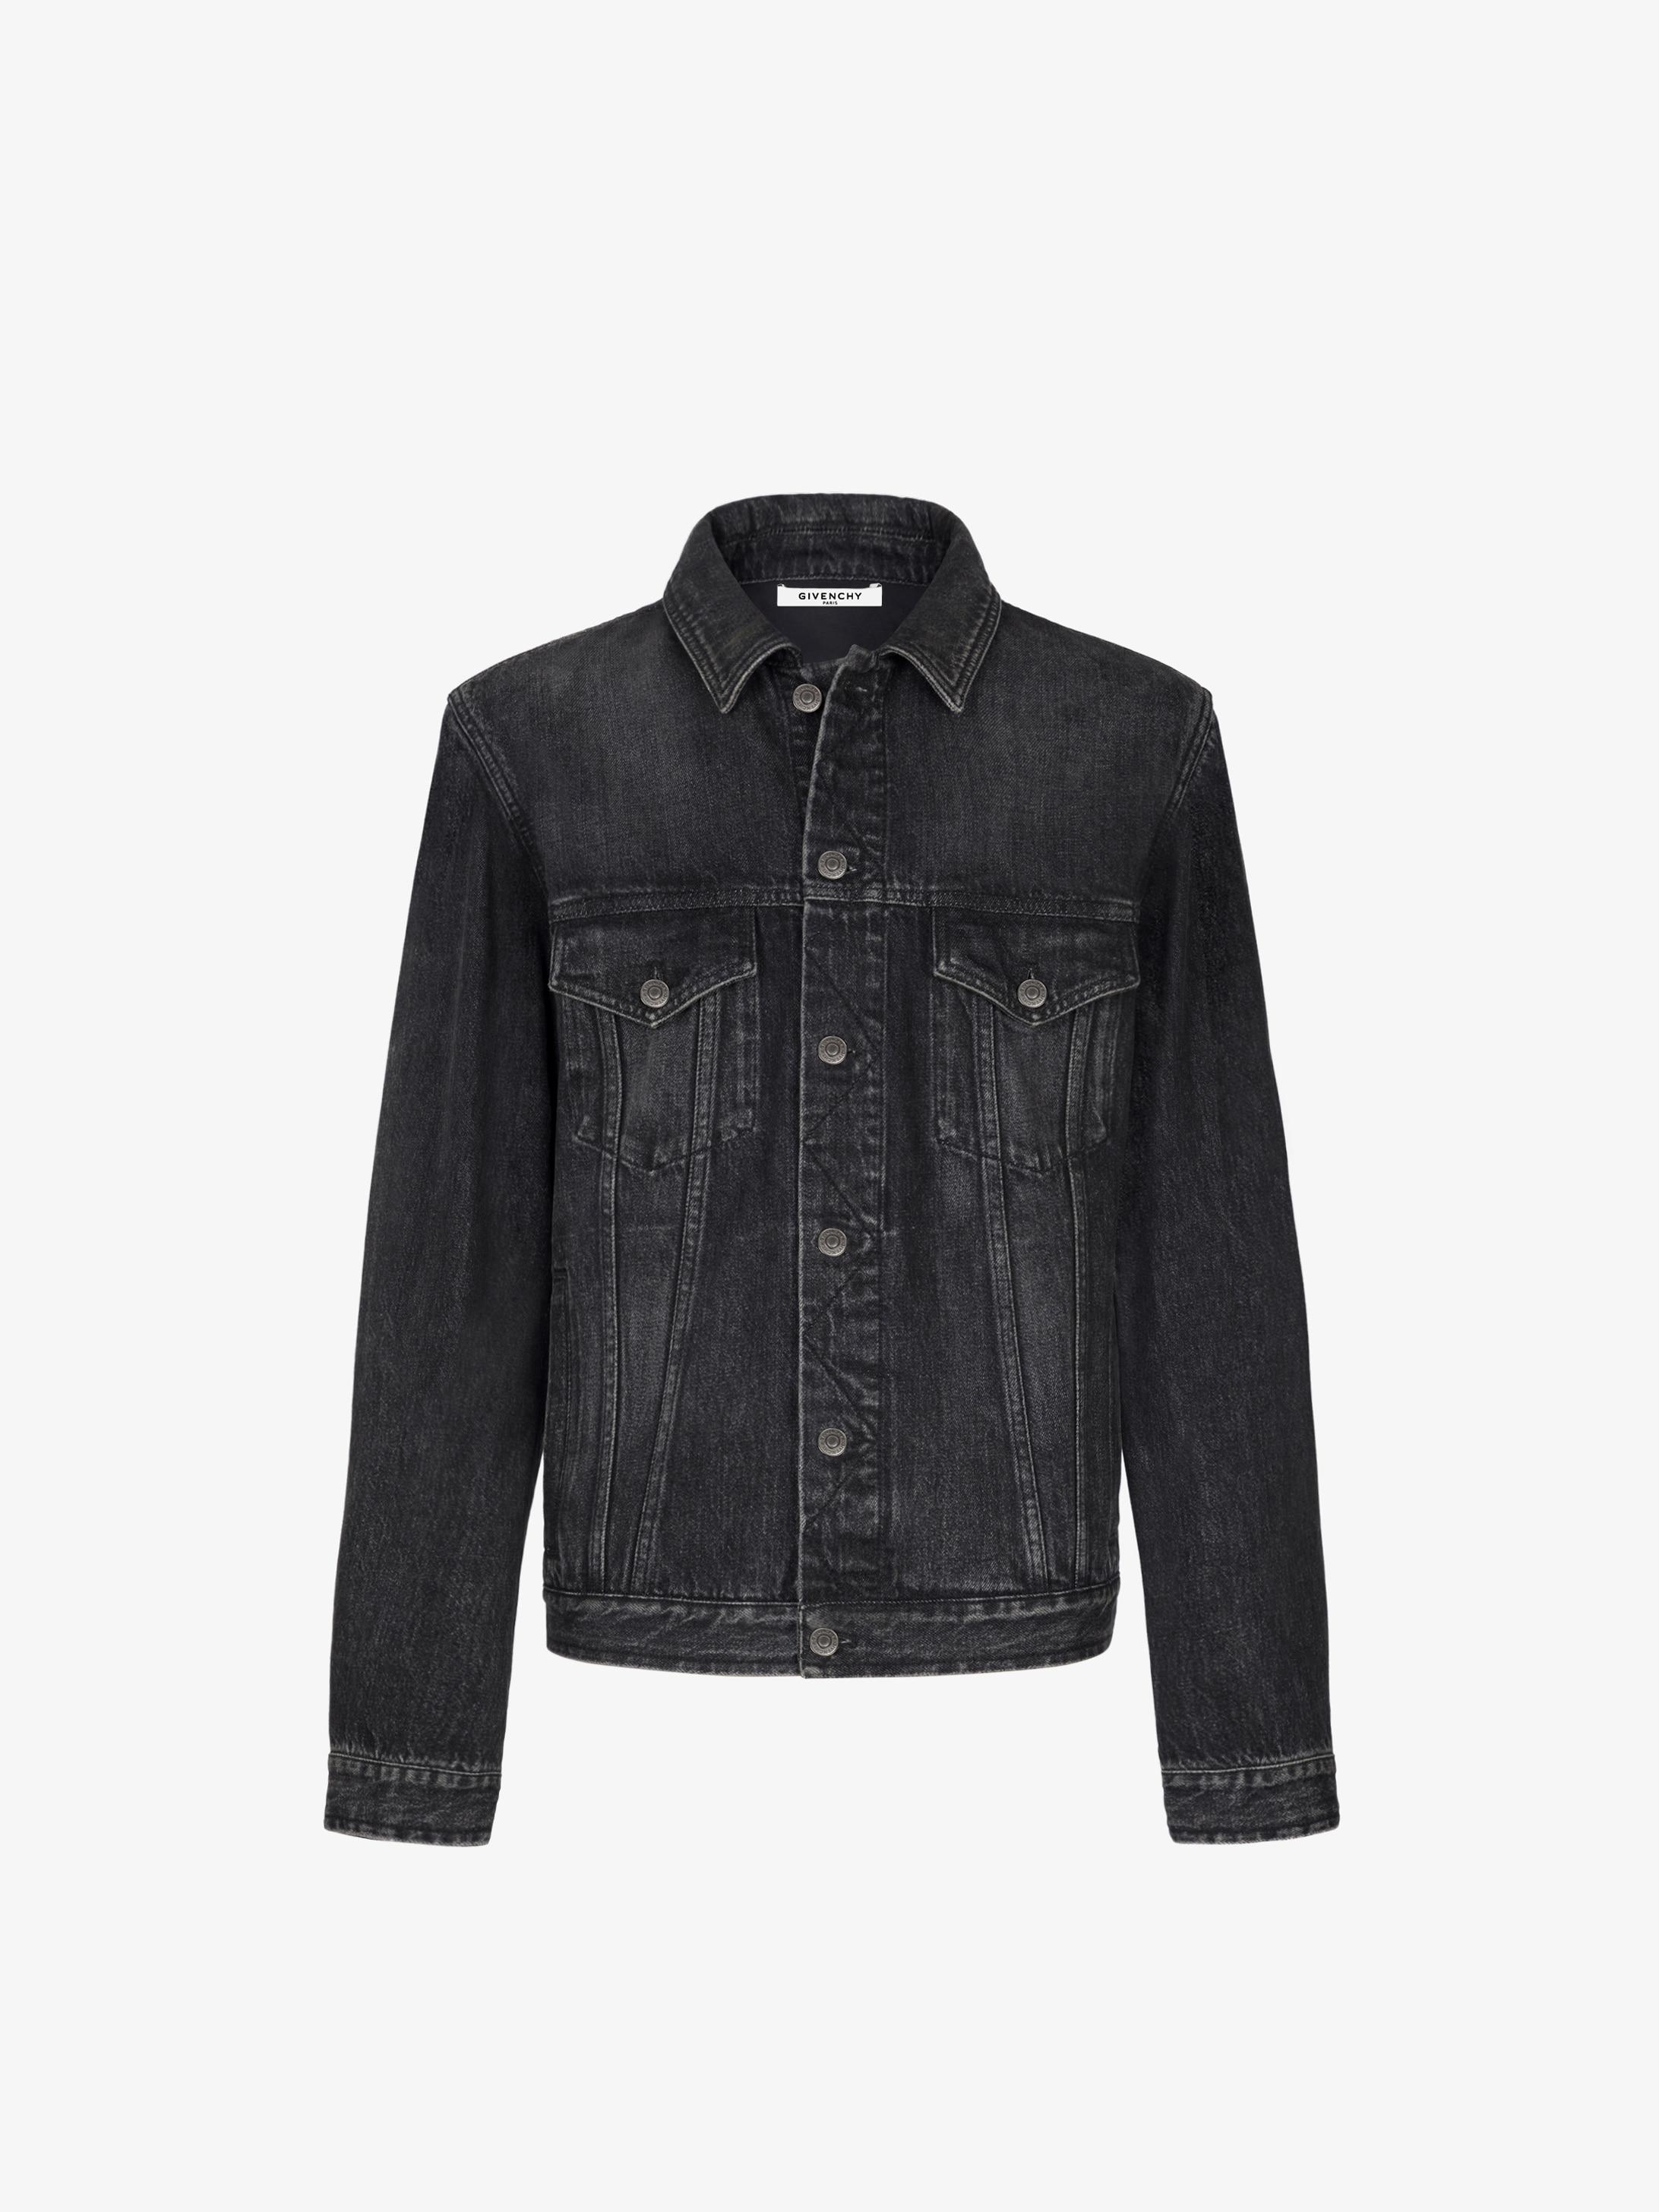 Atelier GIVENCHY jacket in denim